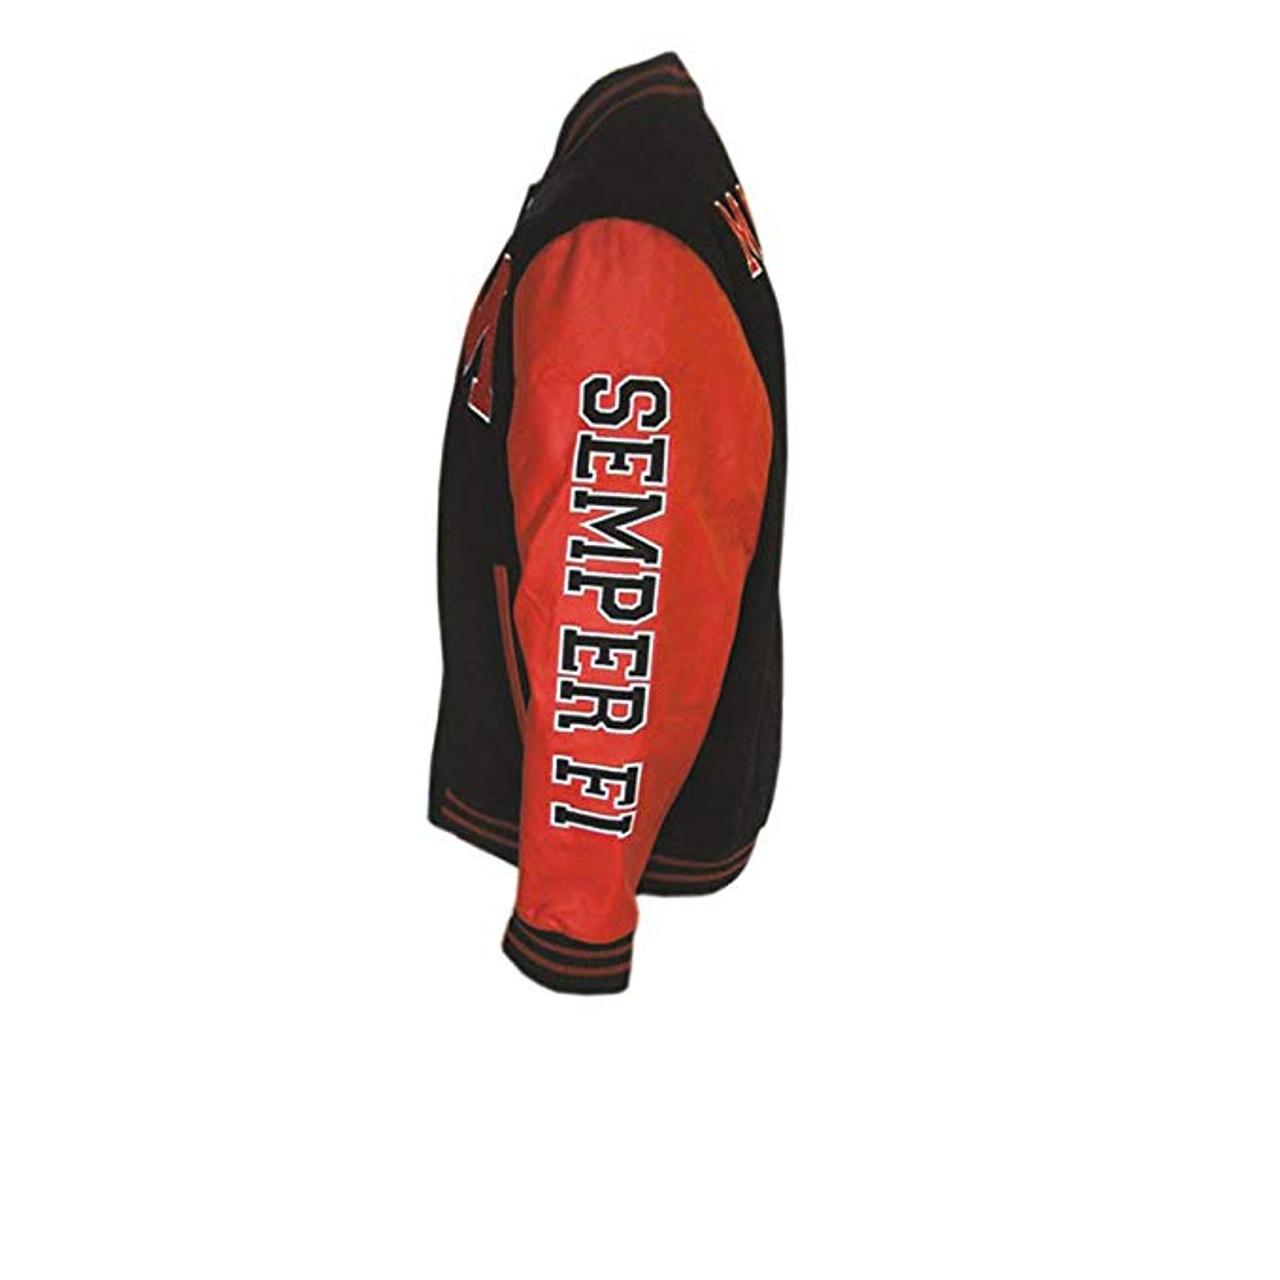 7a5ba7ed476 ... 23244 - Marines Varsity Jacket With USMC Logo - SEMPER FI - Black Red